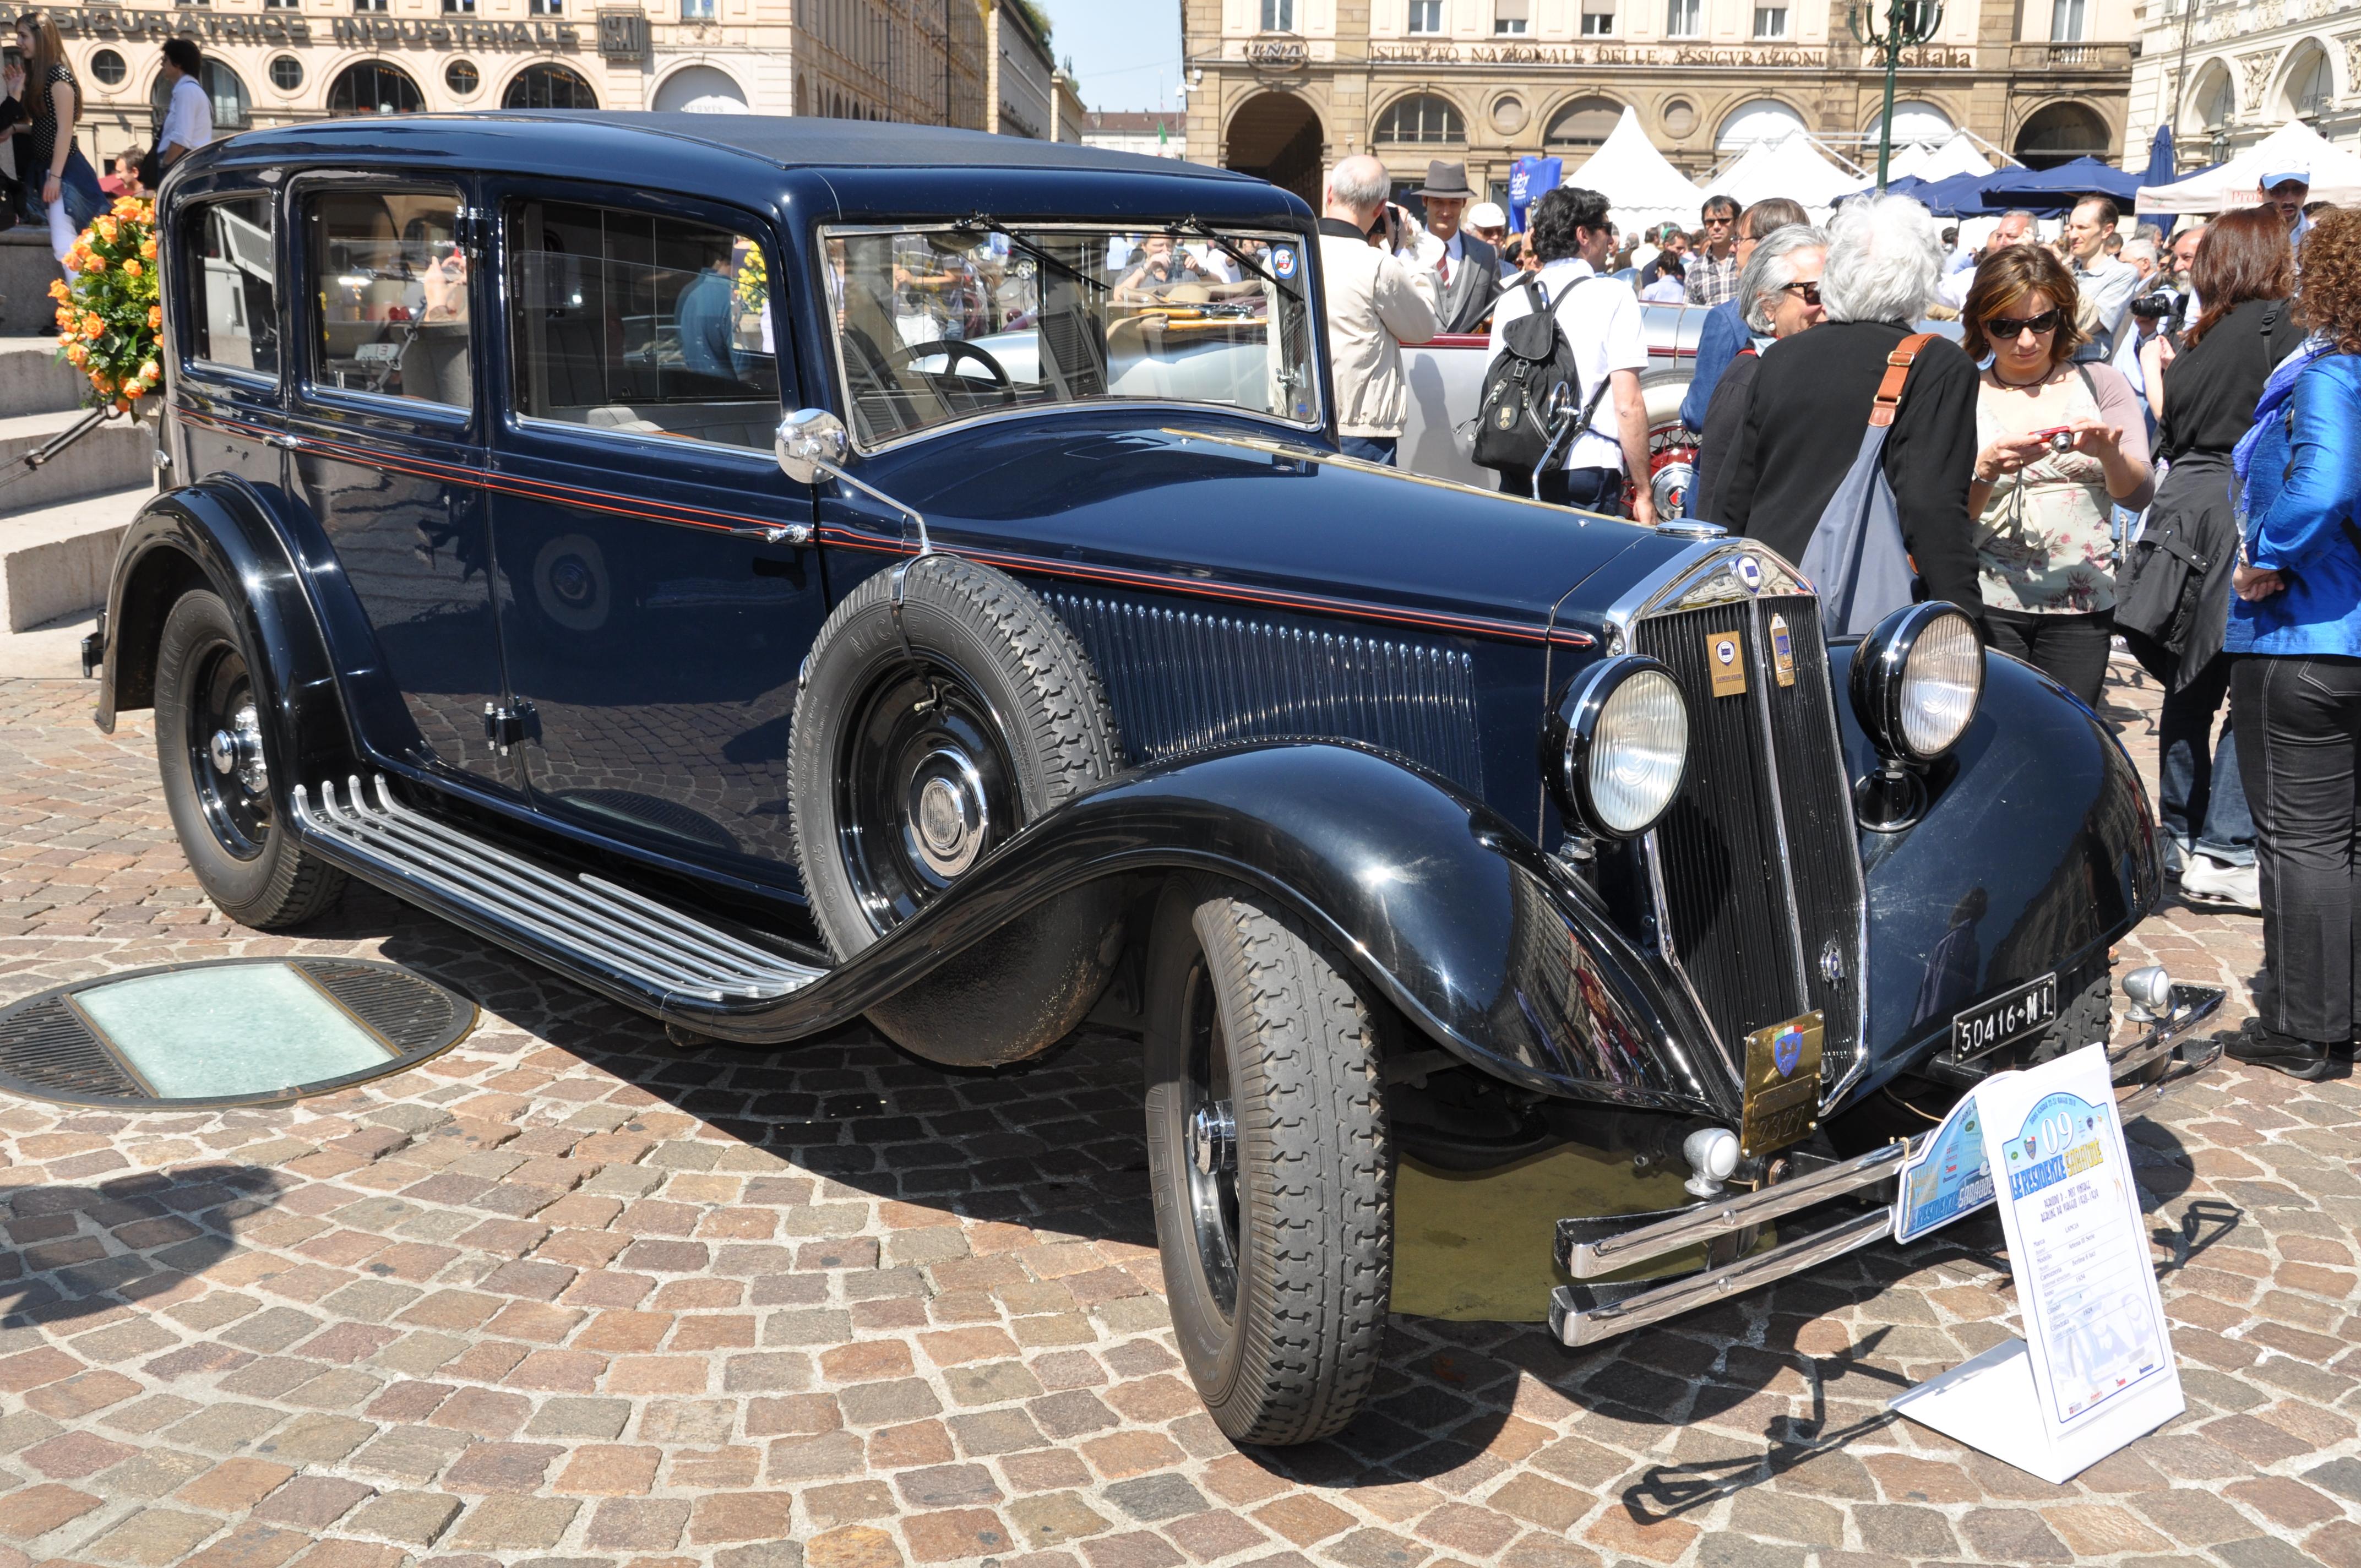 https://upload.wikimedia.org/wikipedia/commons/8/87/Lancia_Artena_III_Serie_%281934%29_%284640639990%29.jpg